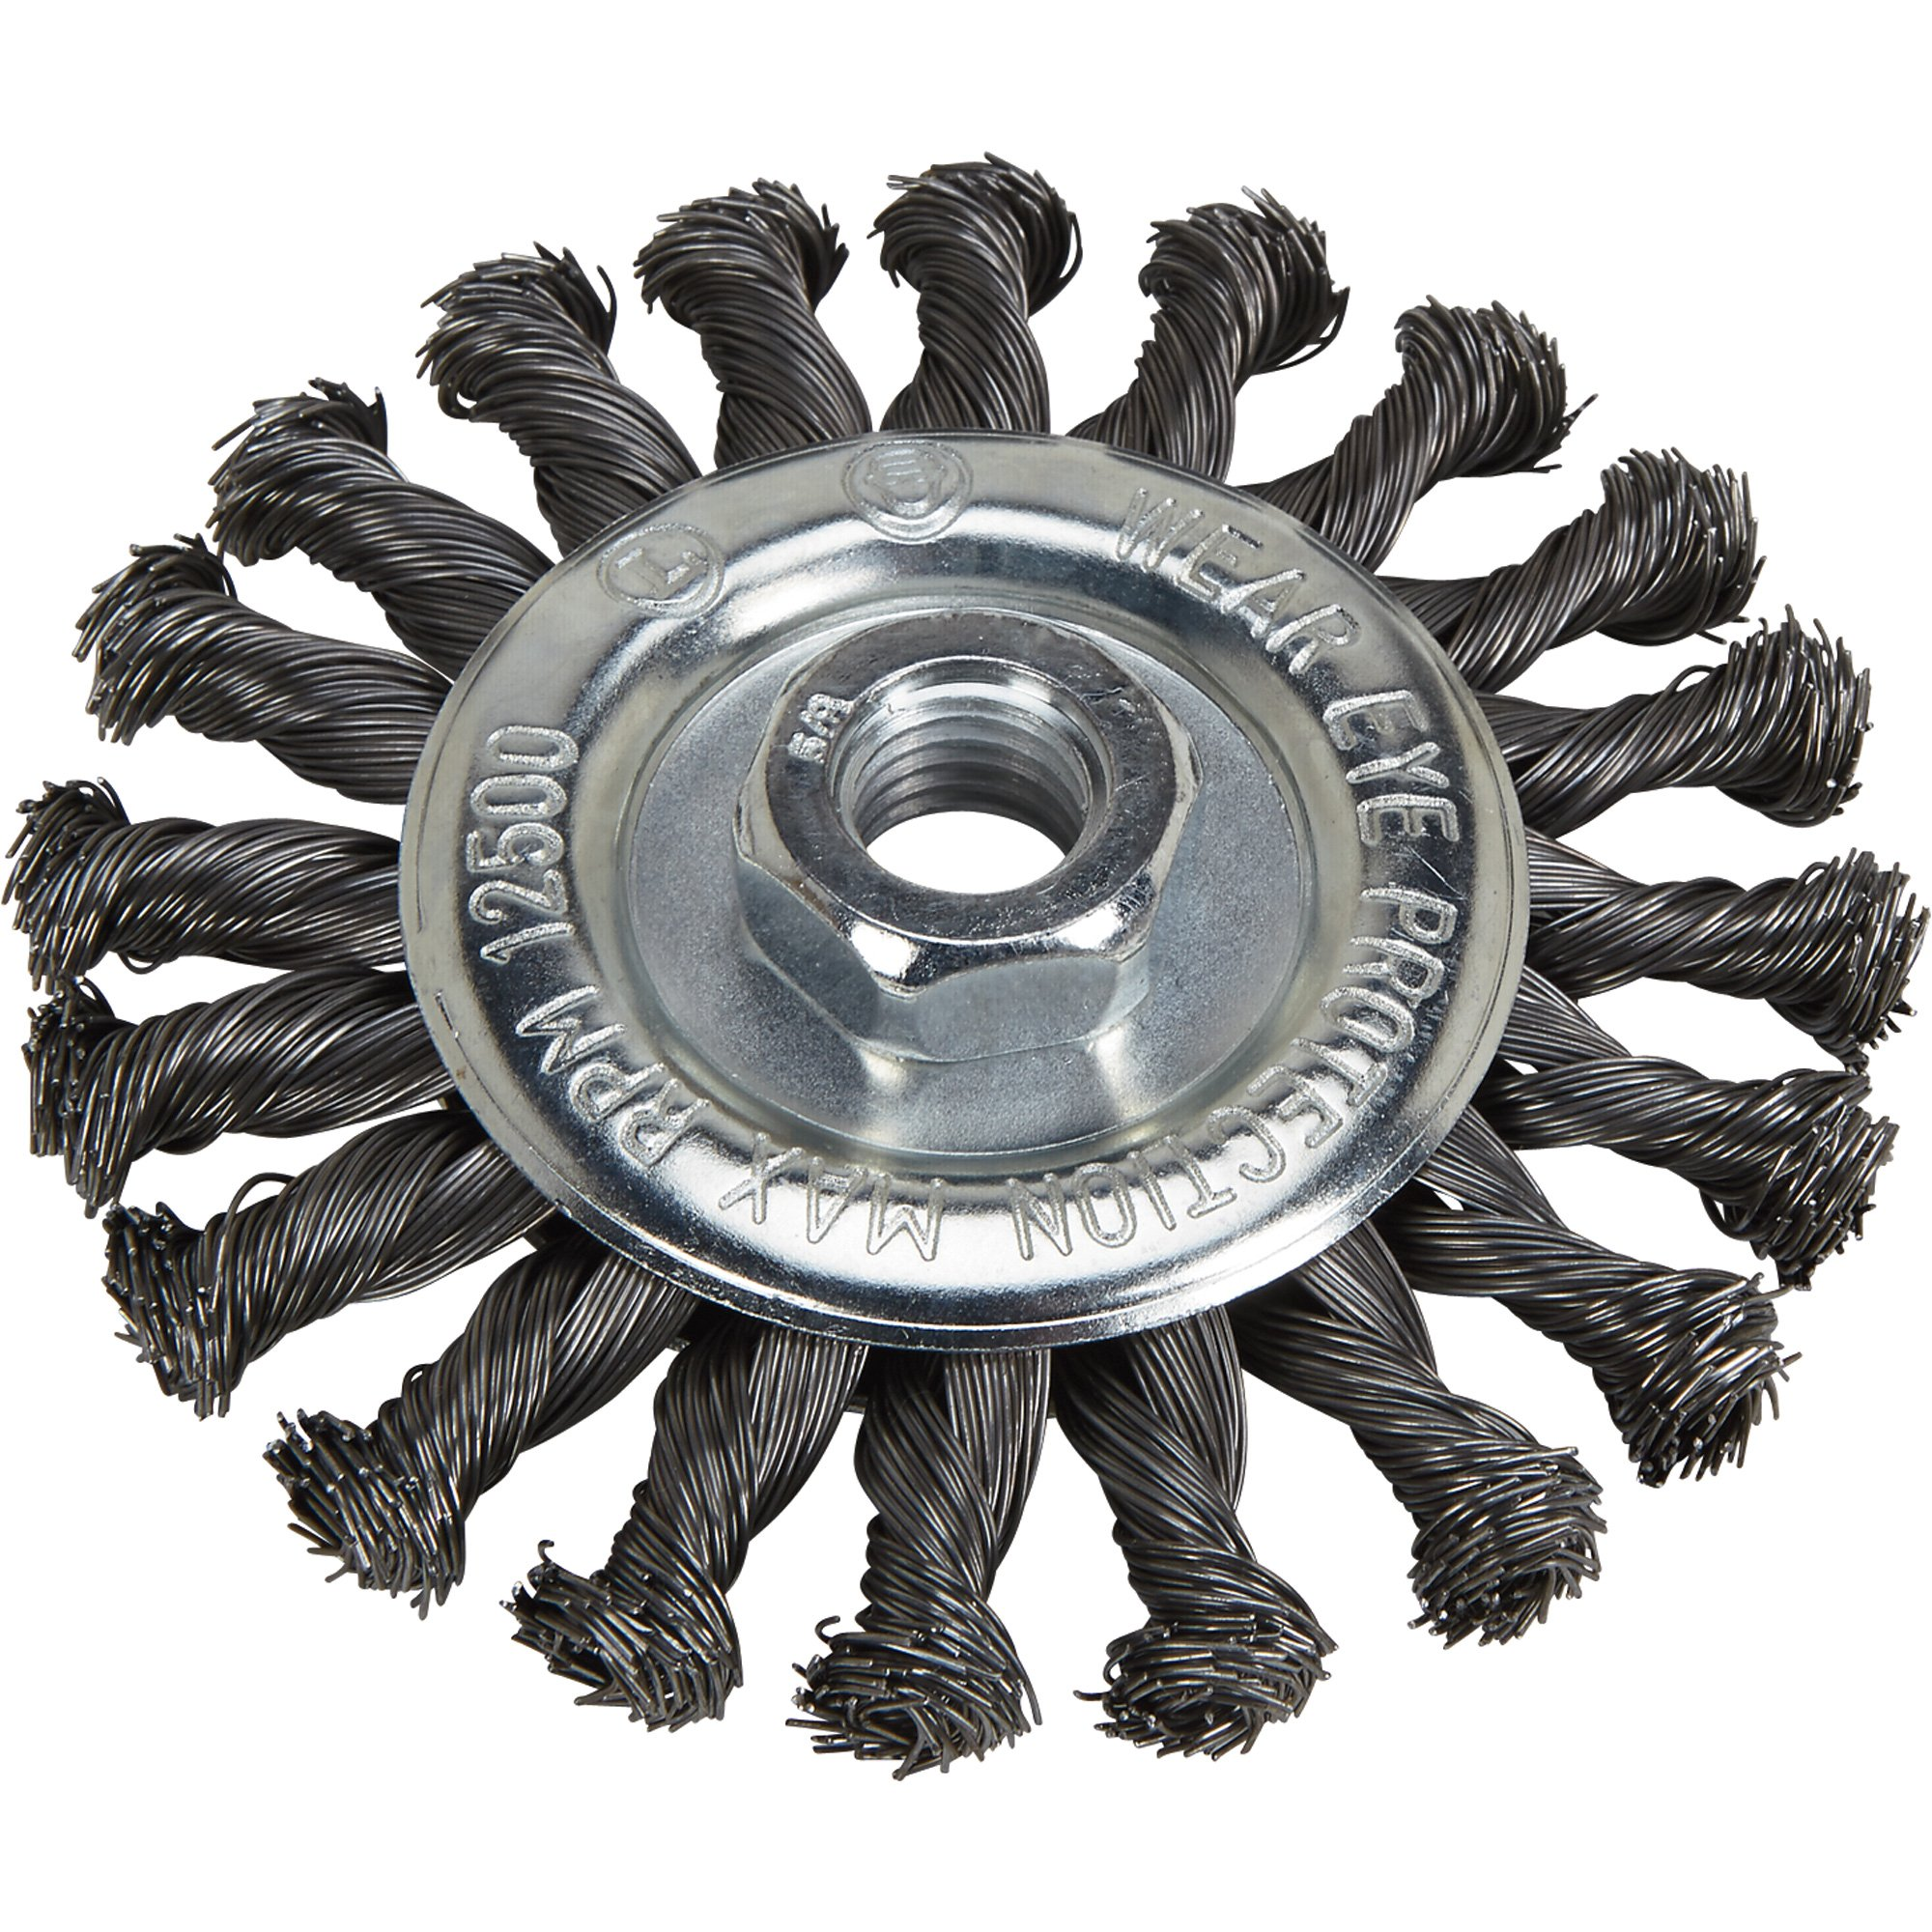 Klutch 4.5in. Twisted Knot Wire Wheels - 5-Pk.